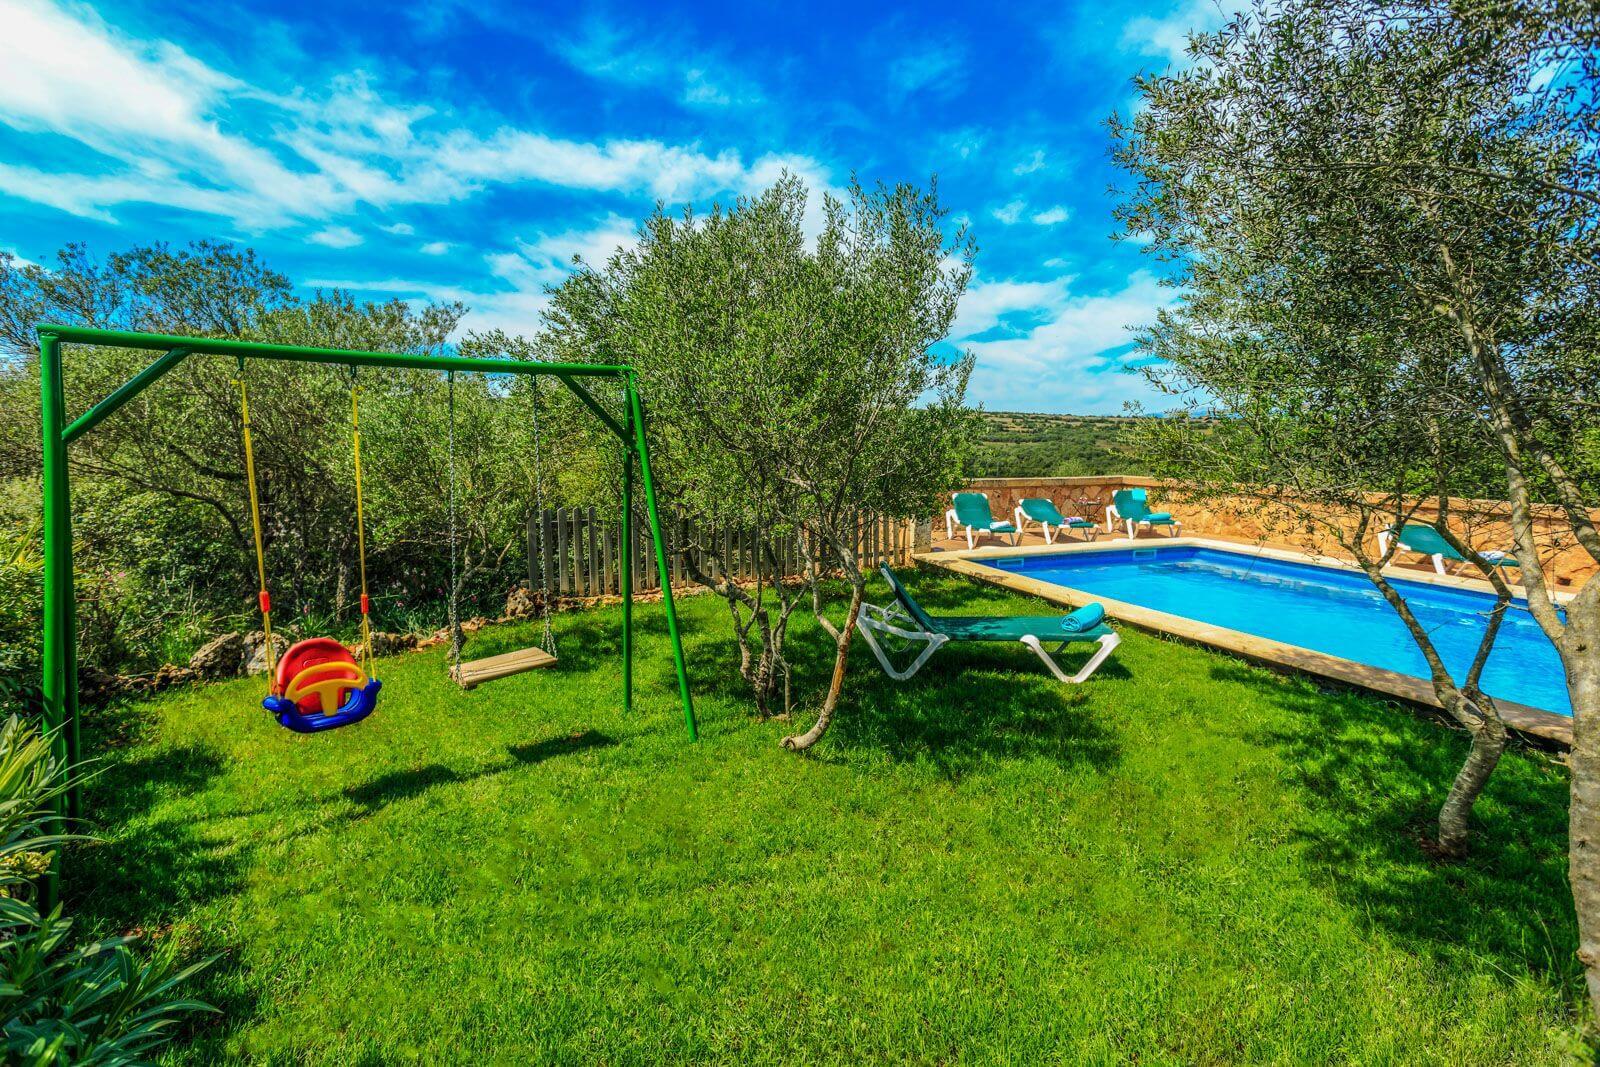 Finca Melito – Kinder Schaukel am Pool